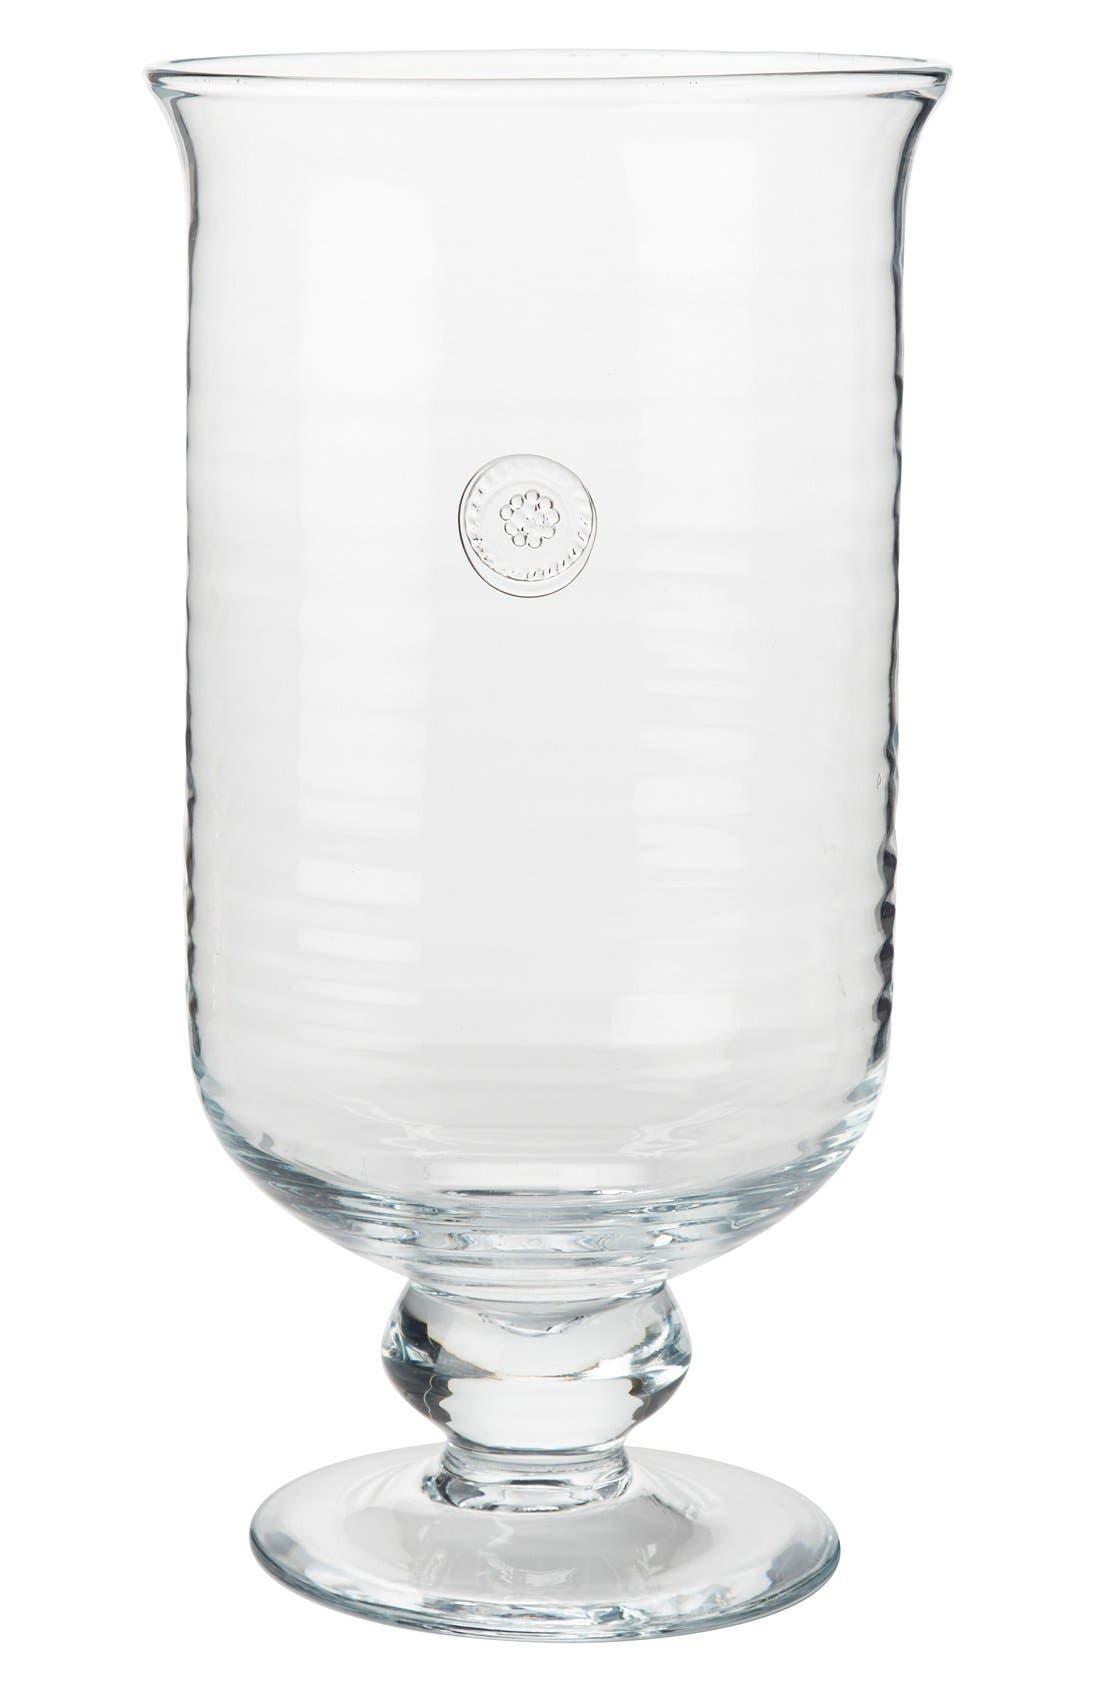 Juliska Berry  Thread Large Hurricane Glass Candleholder Size One Size  White